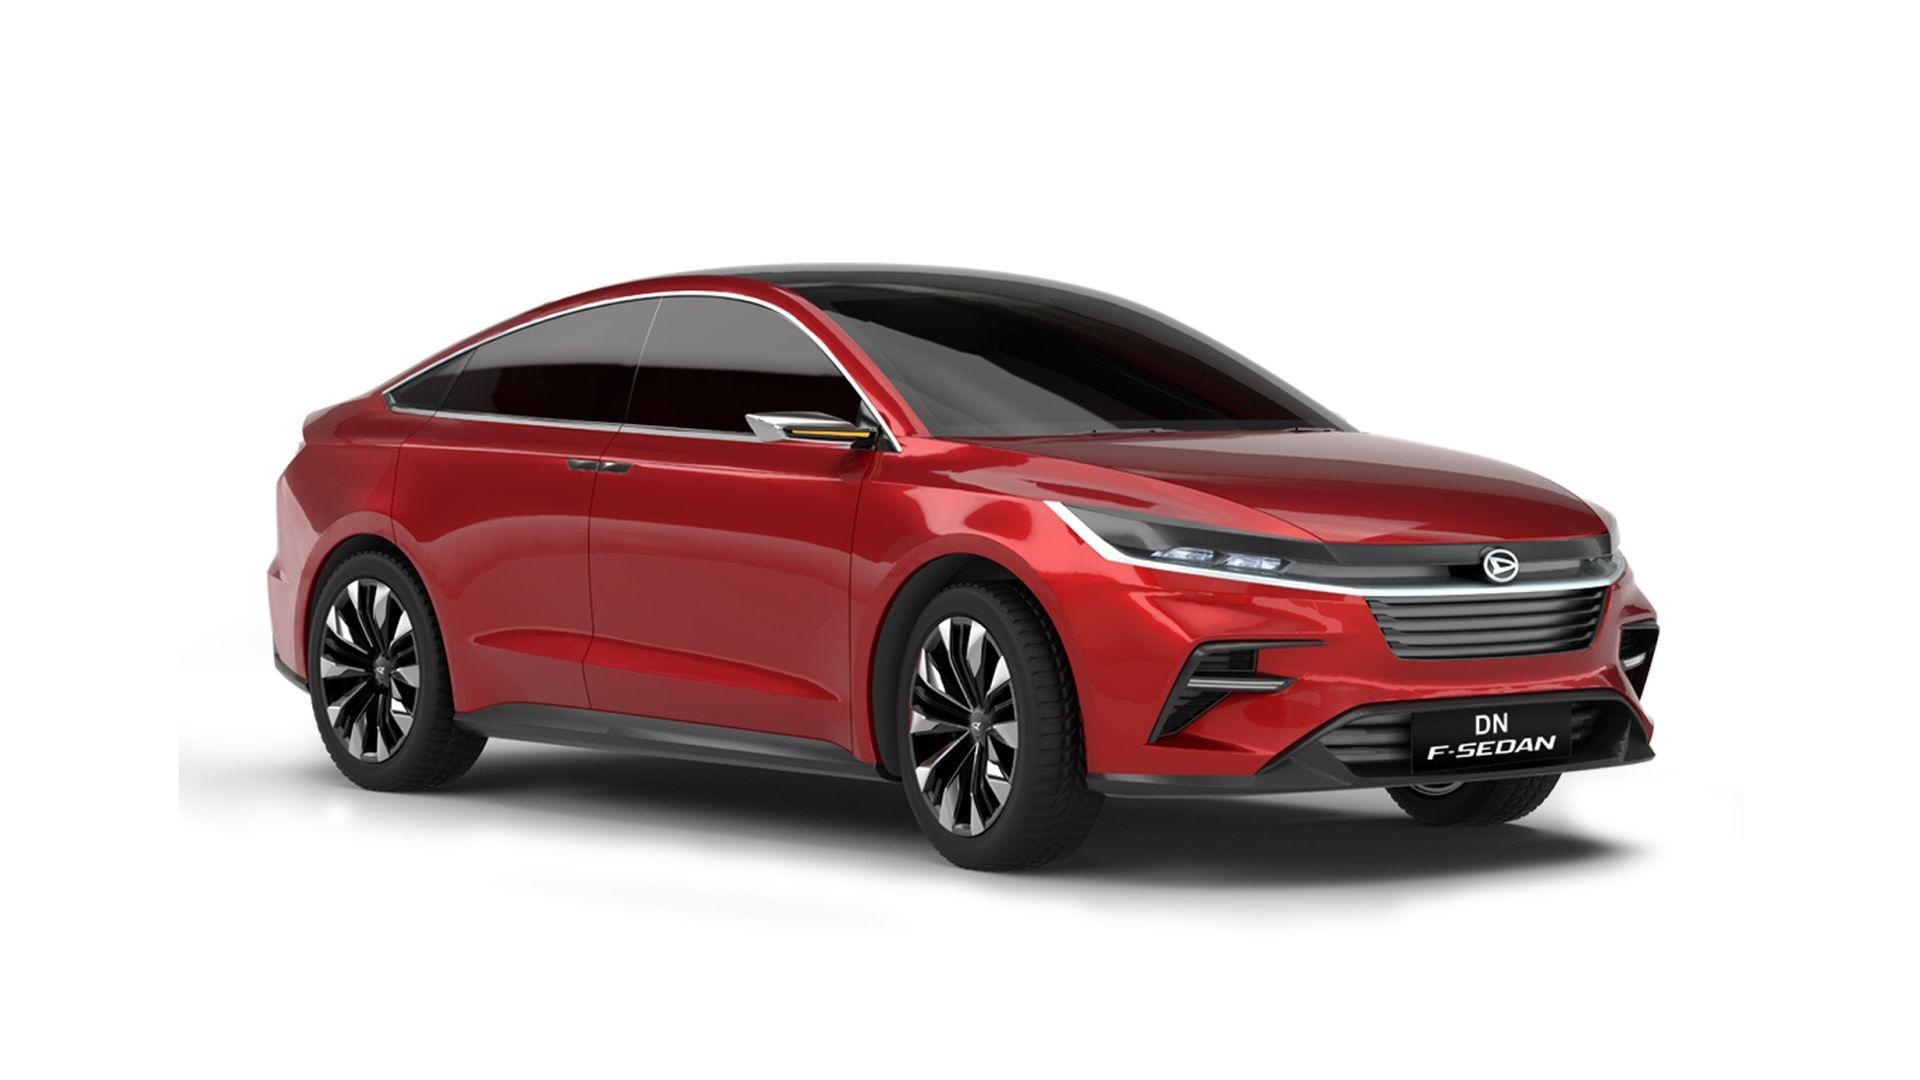 daihatsu-dn-f-sedan-concept.jpg